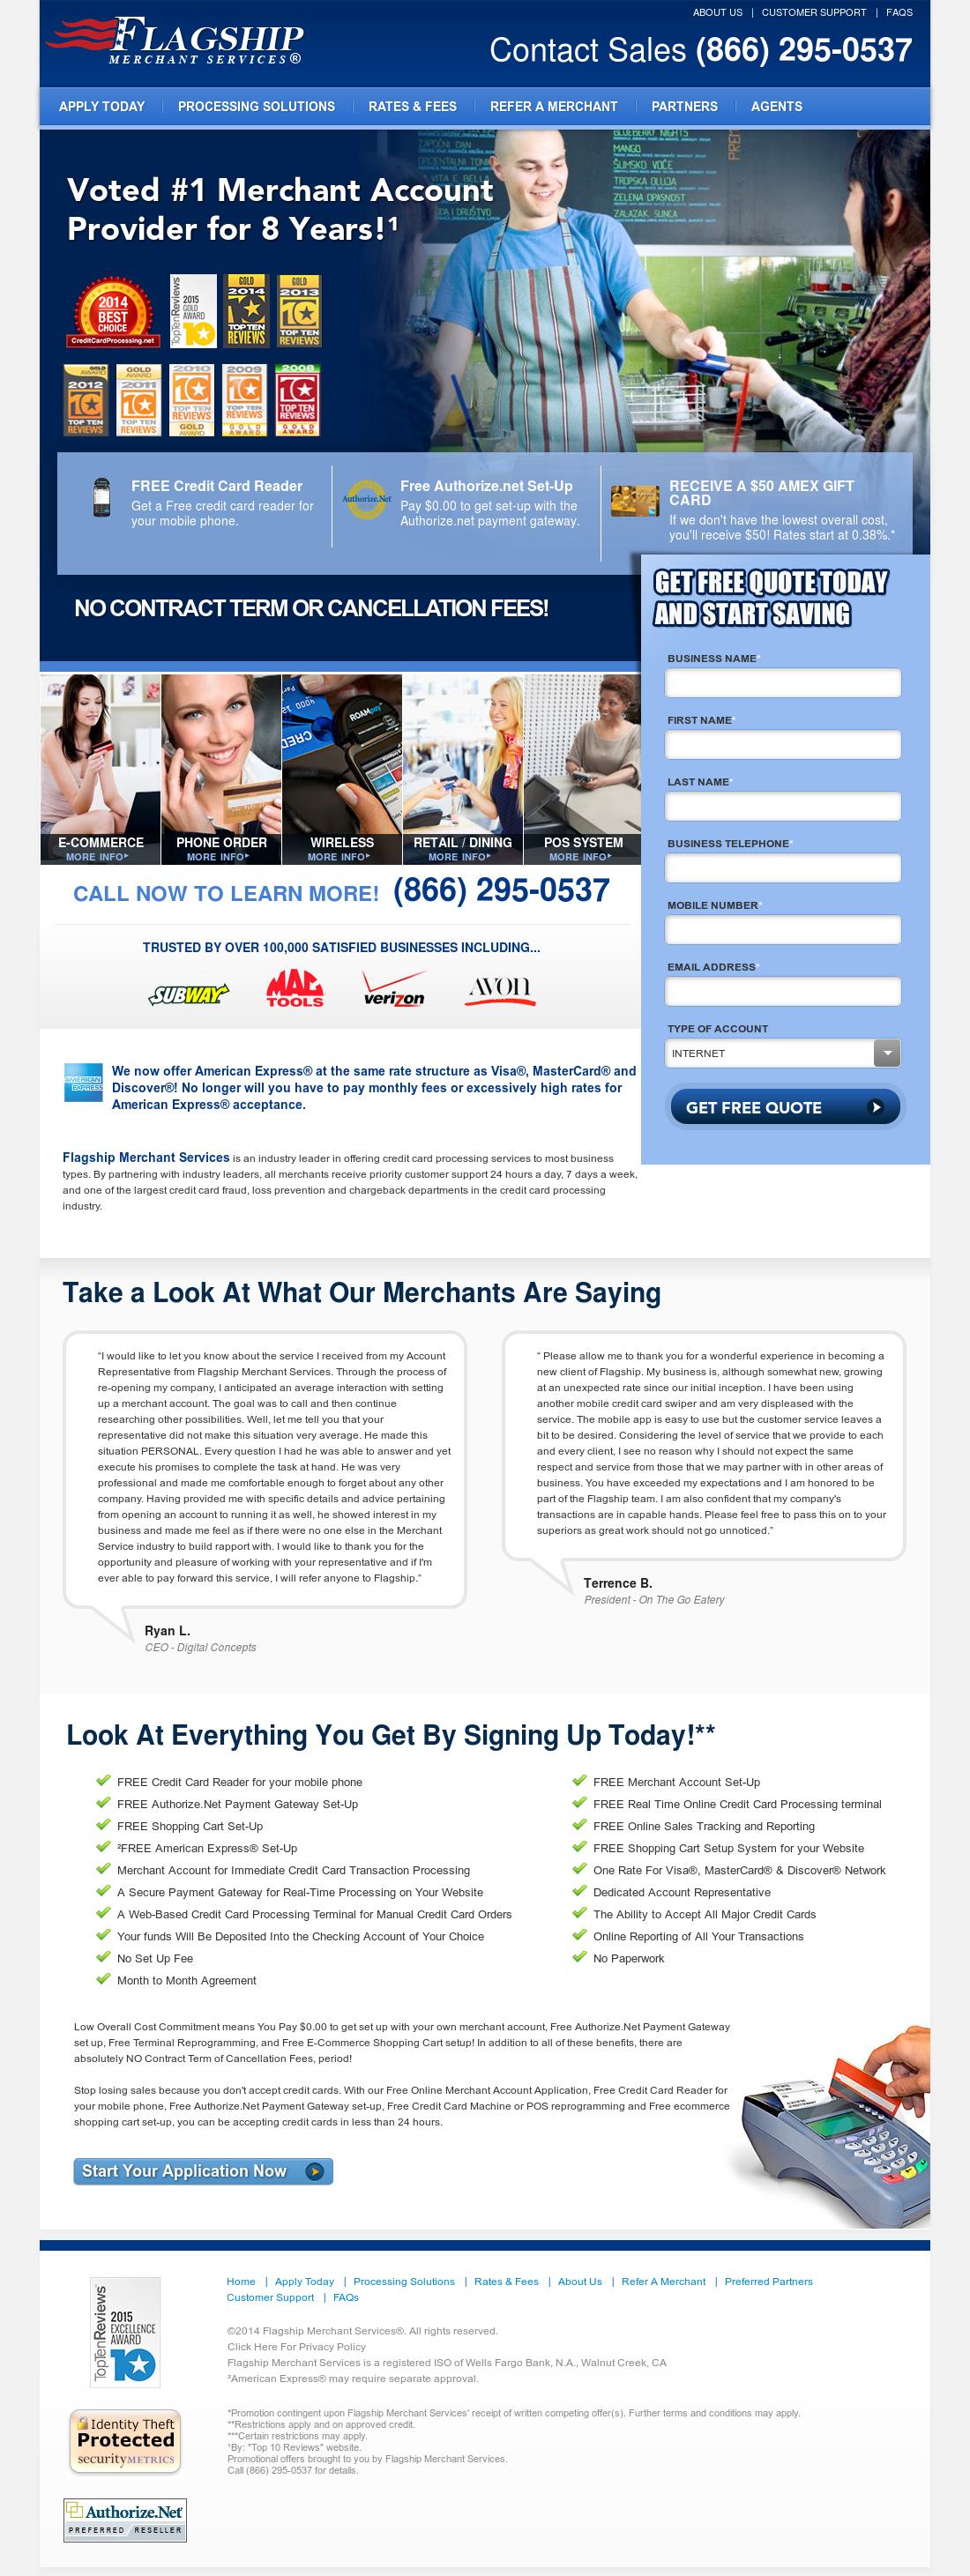 Flagship Merchant Services Competitors, Revenue and